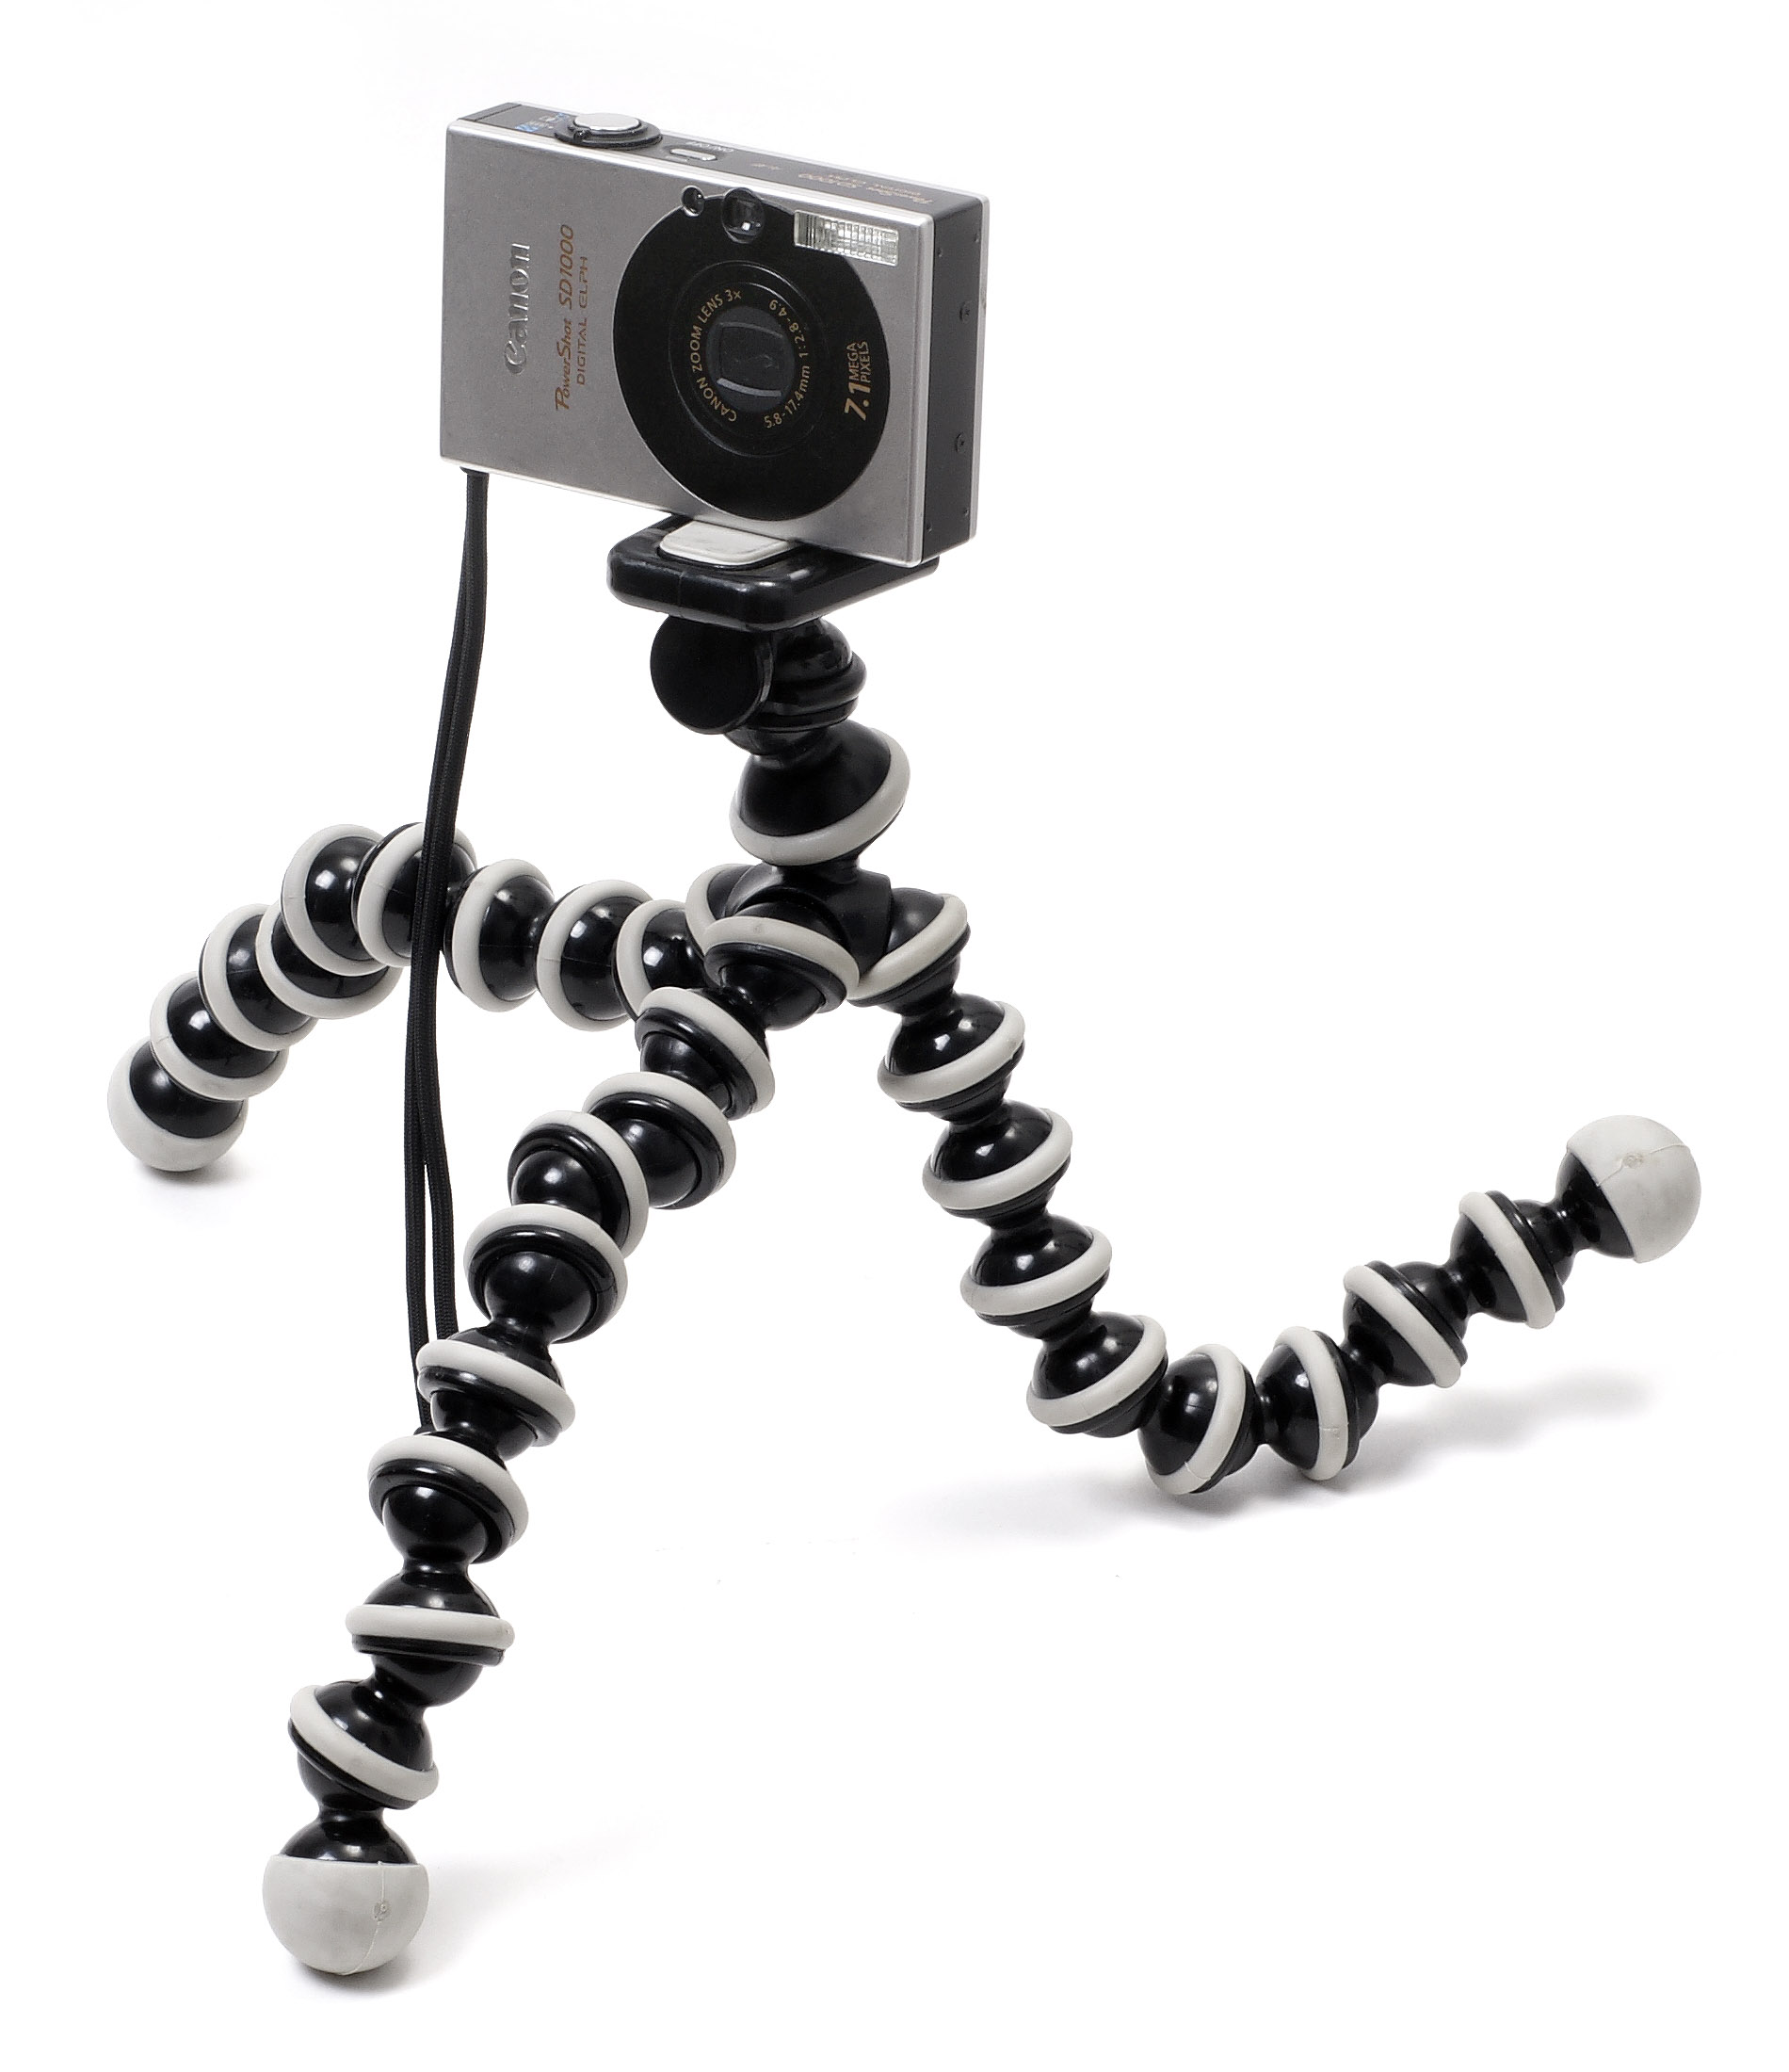 Gorilla Tripod For Iphone  Plus